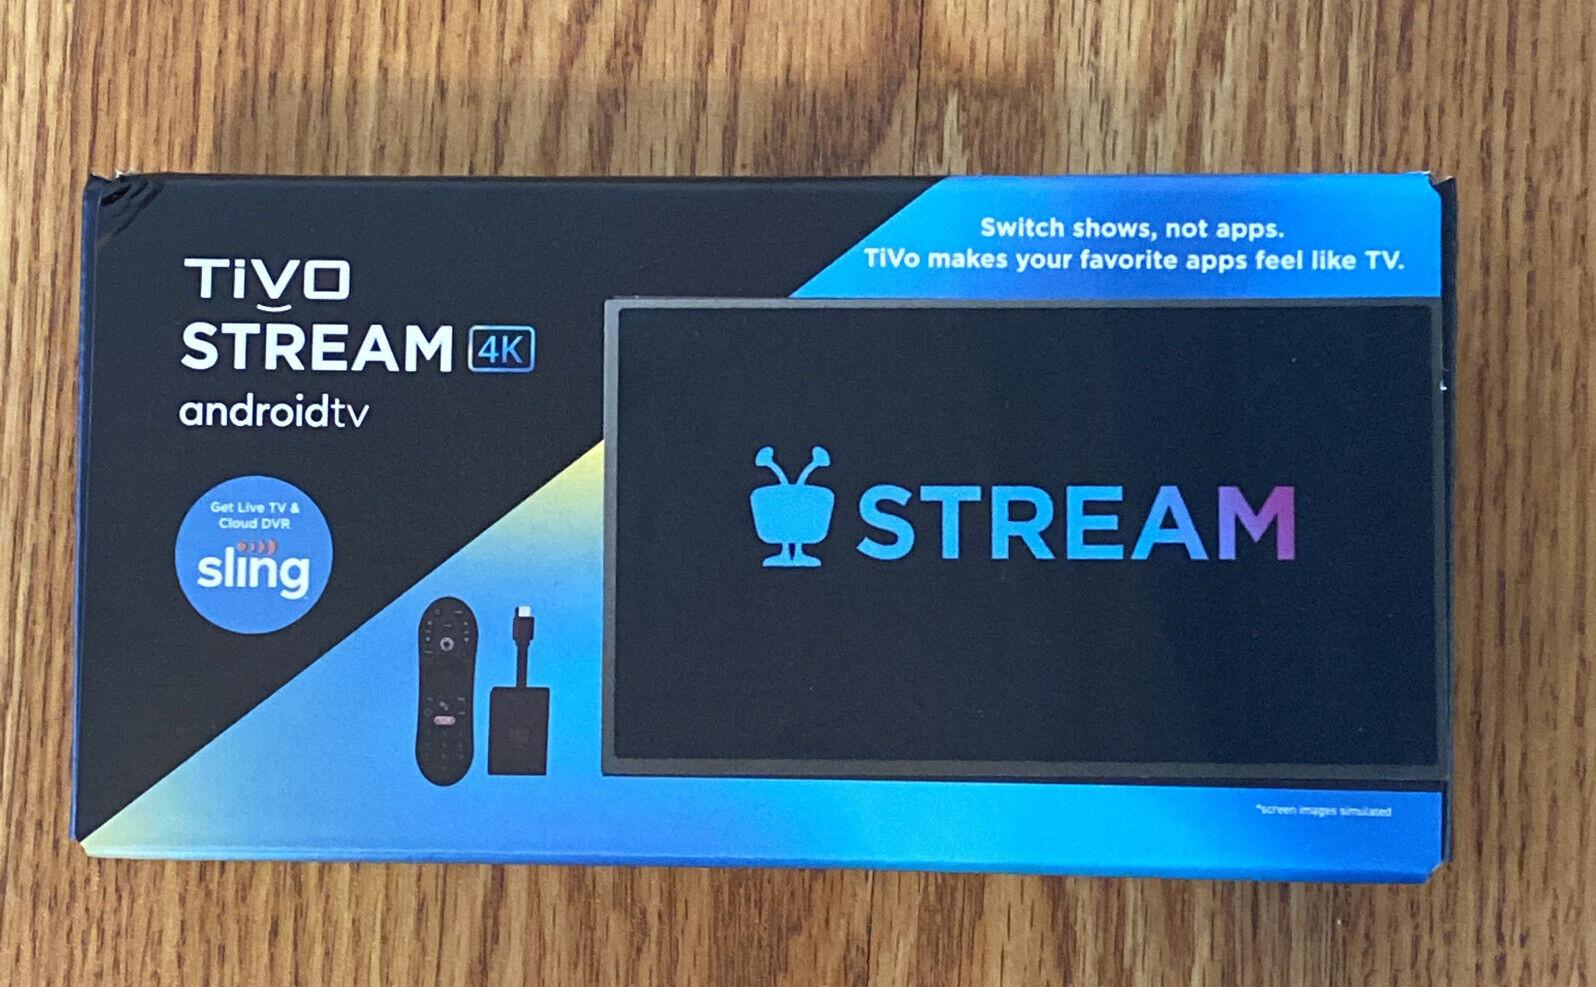 TiVo Stream 4K Android TV Media Player Brand New android brand media new player stream tivo